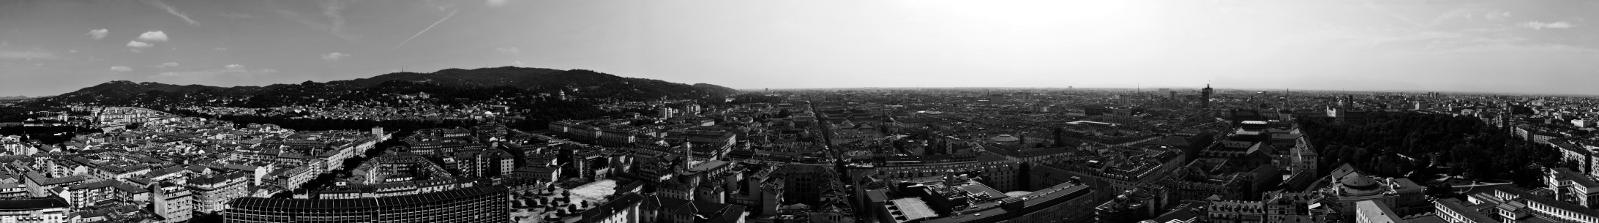 Turin looks like this by Puritanikal